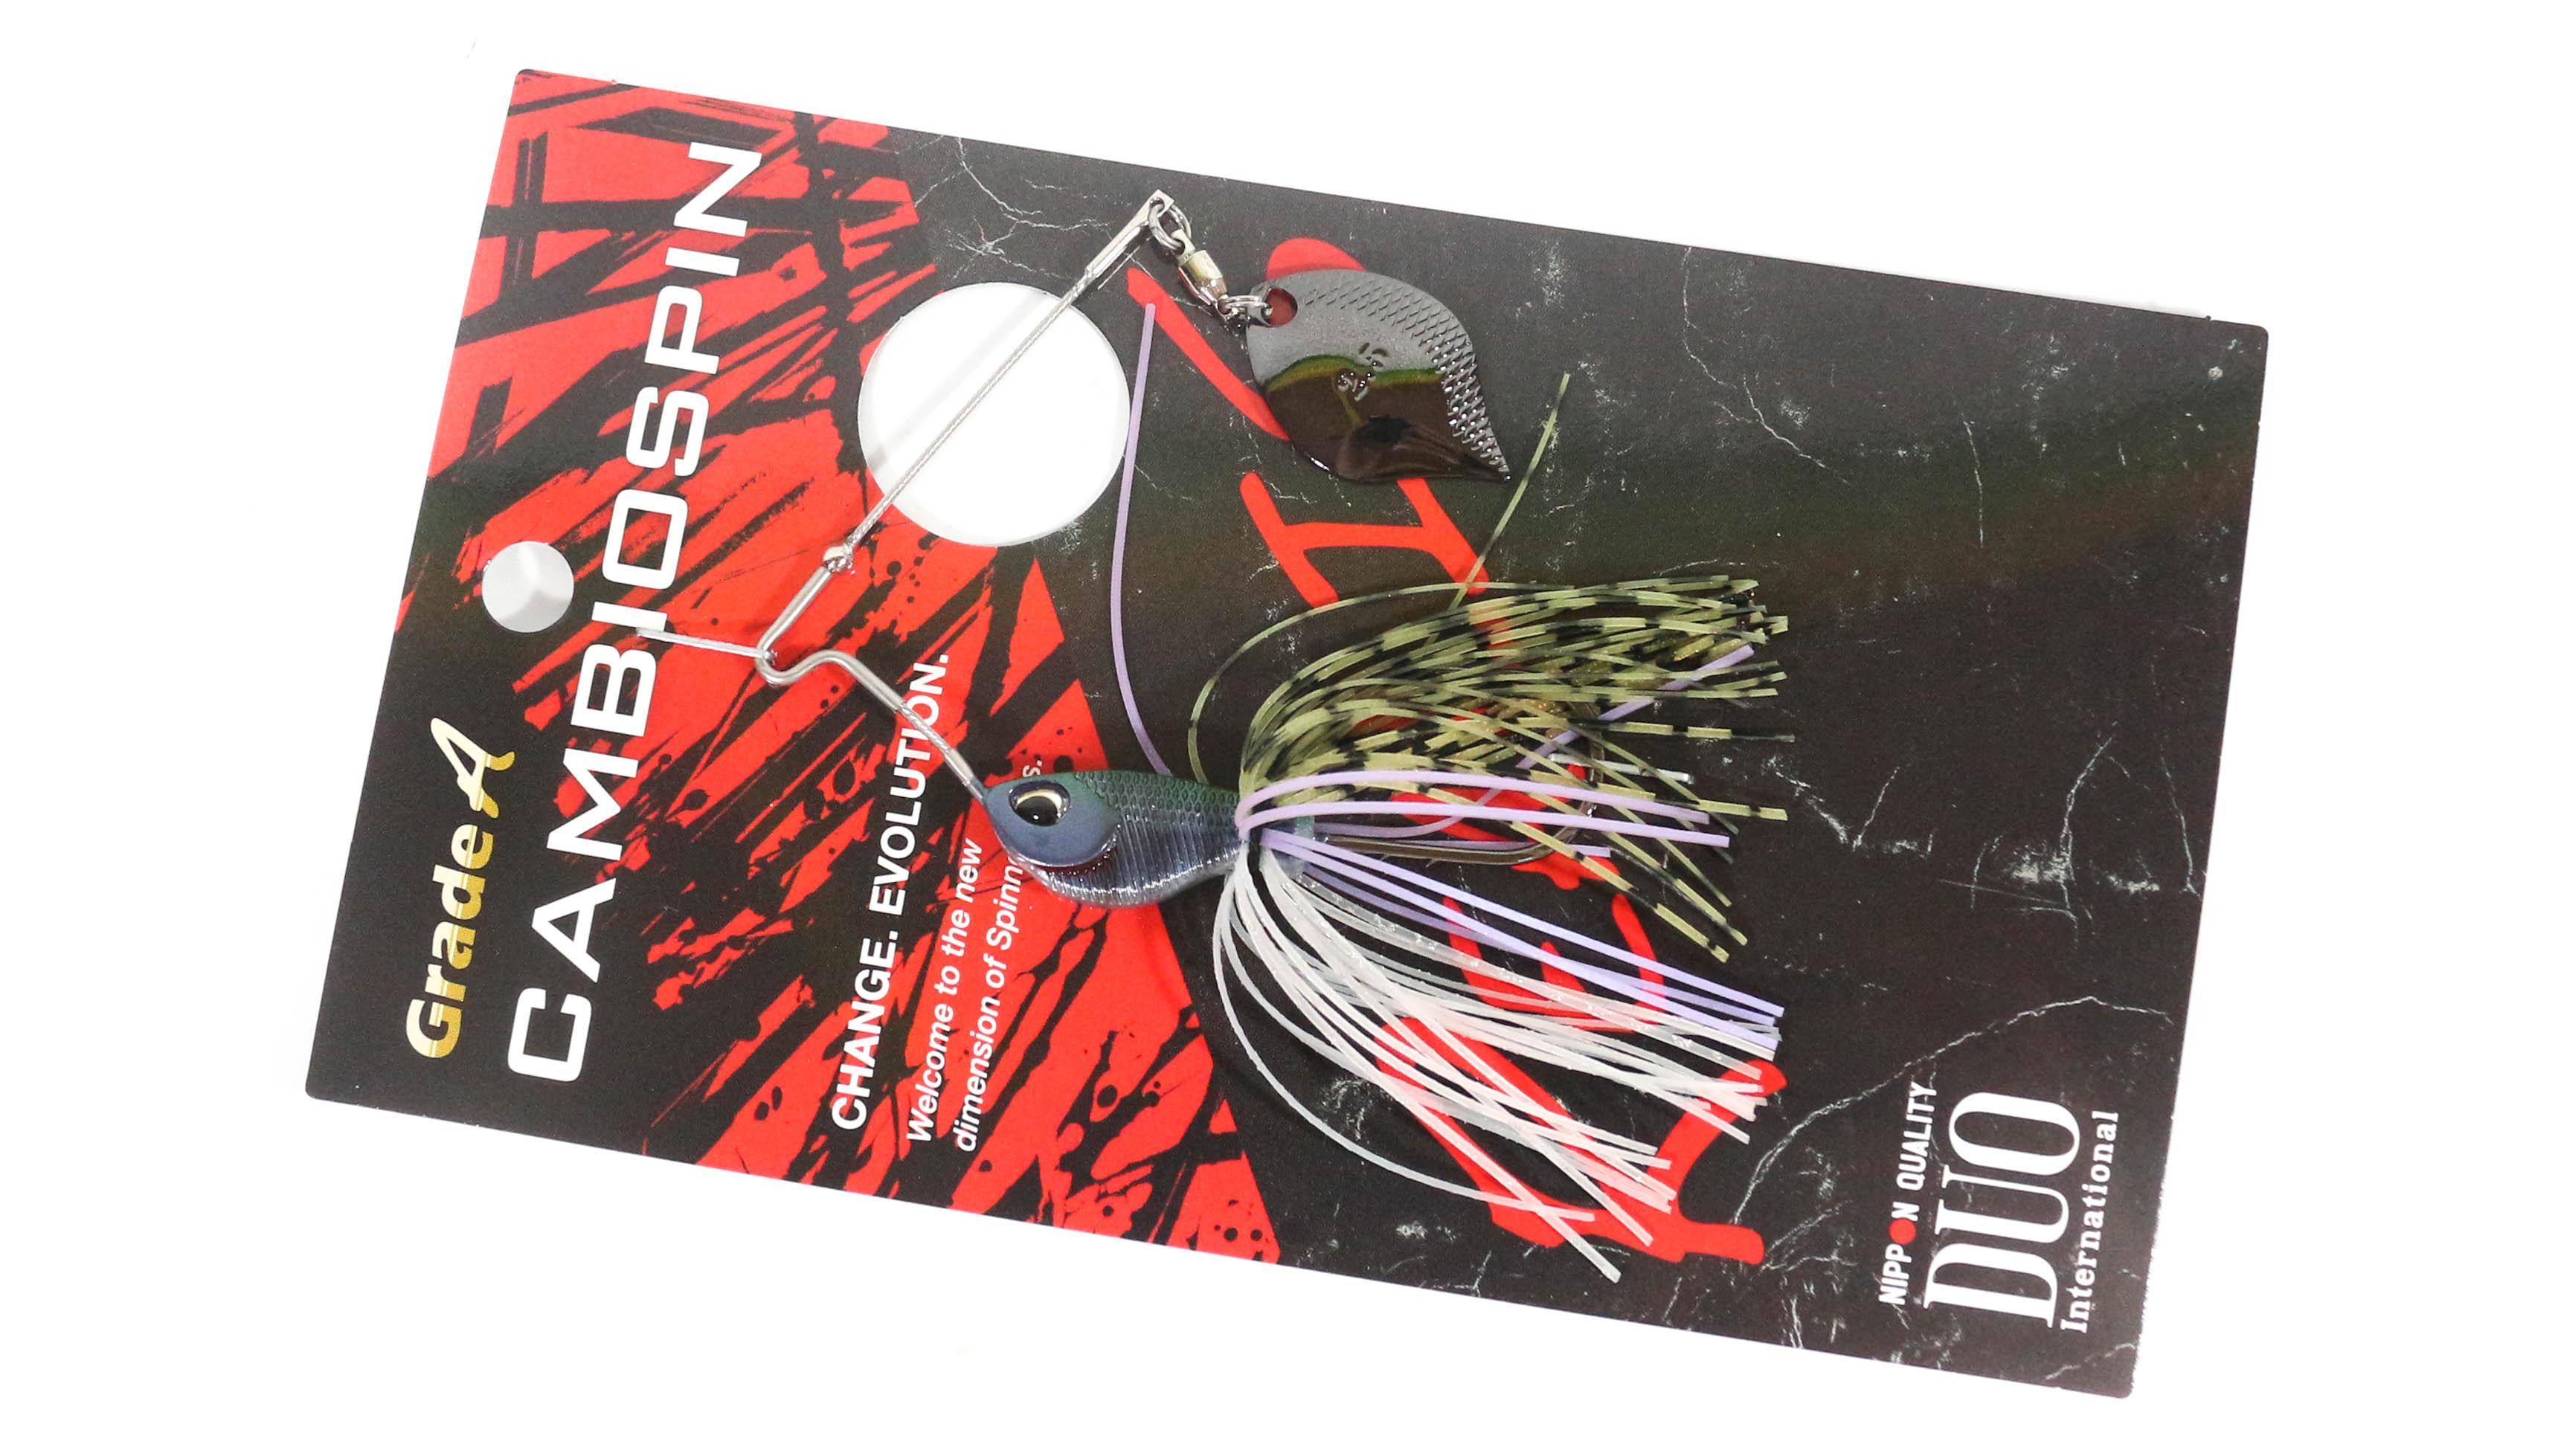 Sale Duo Realis Cambio Spin Spinnerbait Single Blade 1/4 oz J010 (9994)